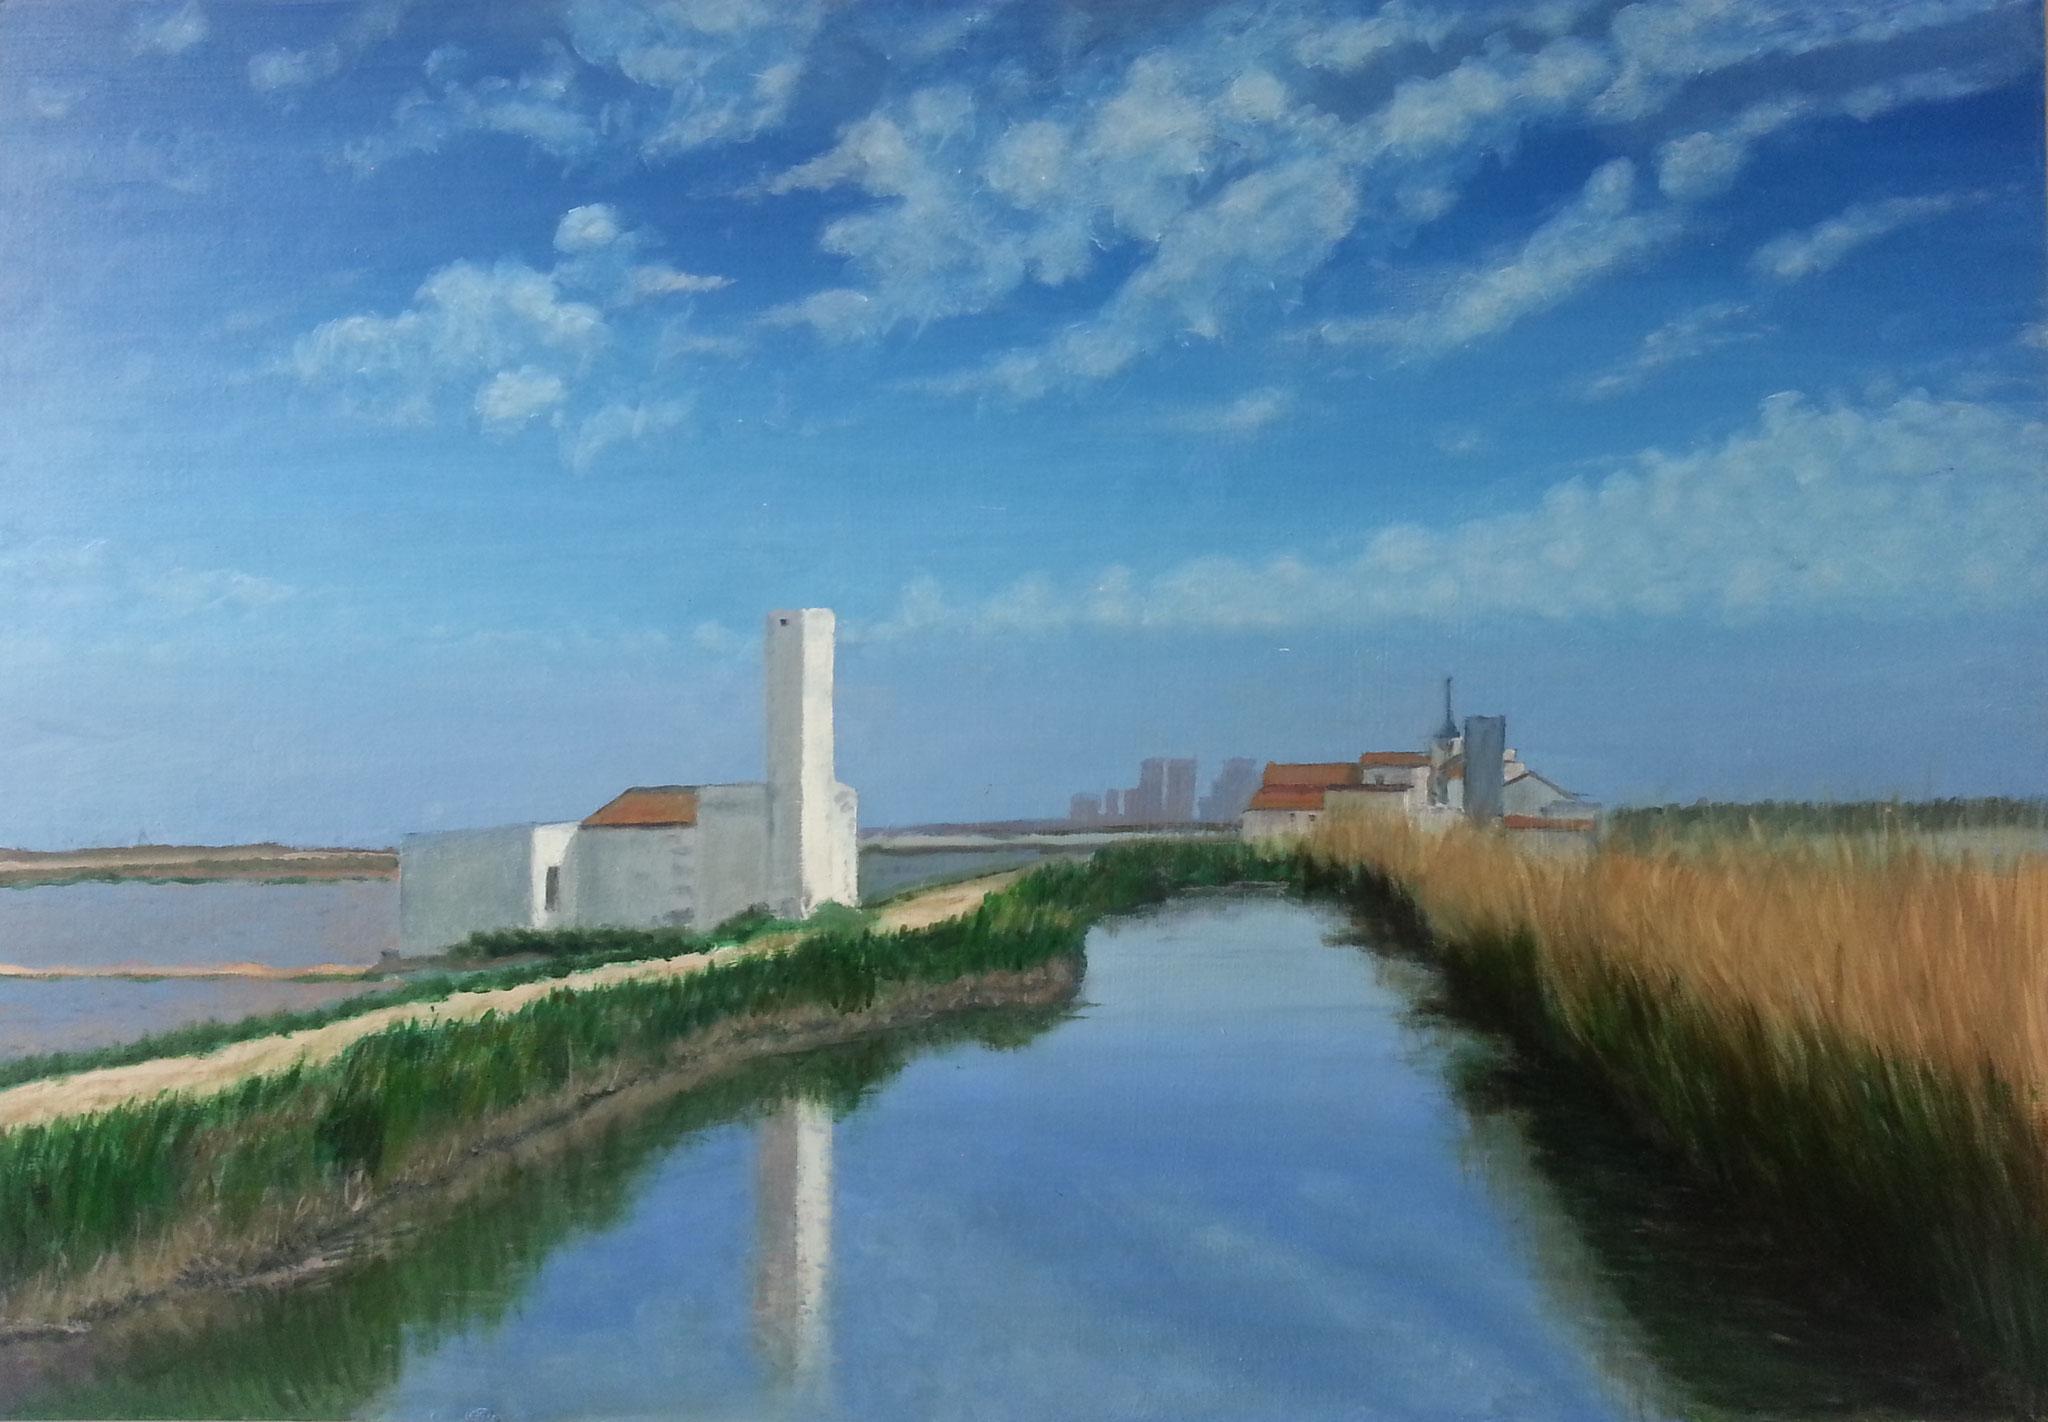 Canal de la Albufera